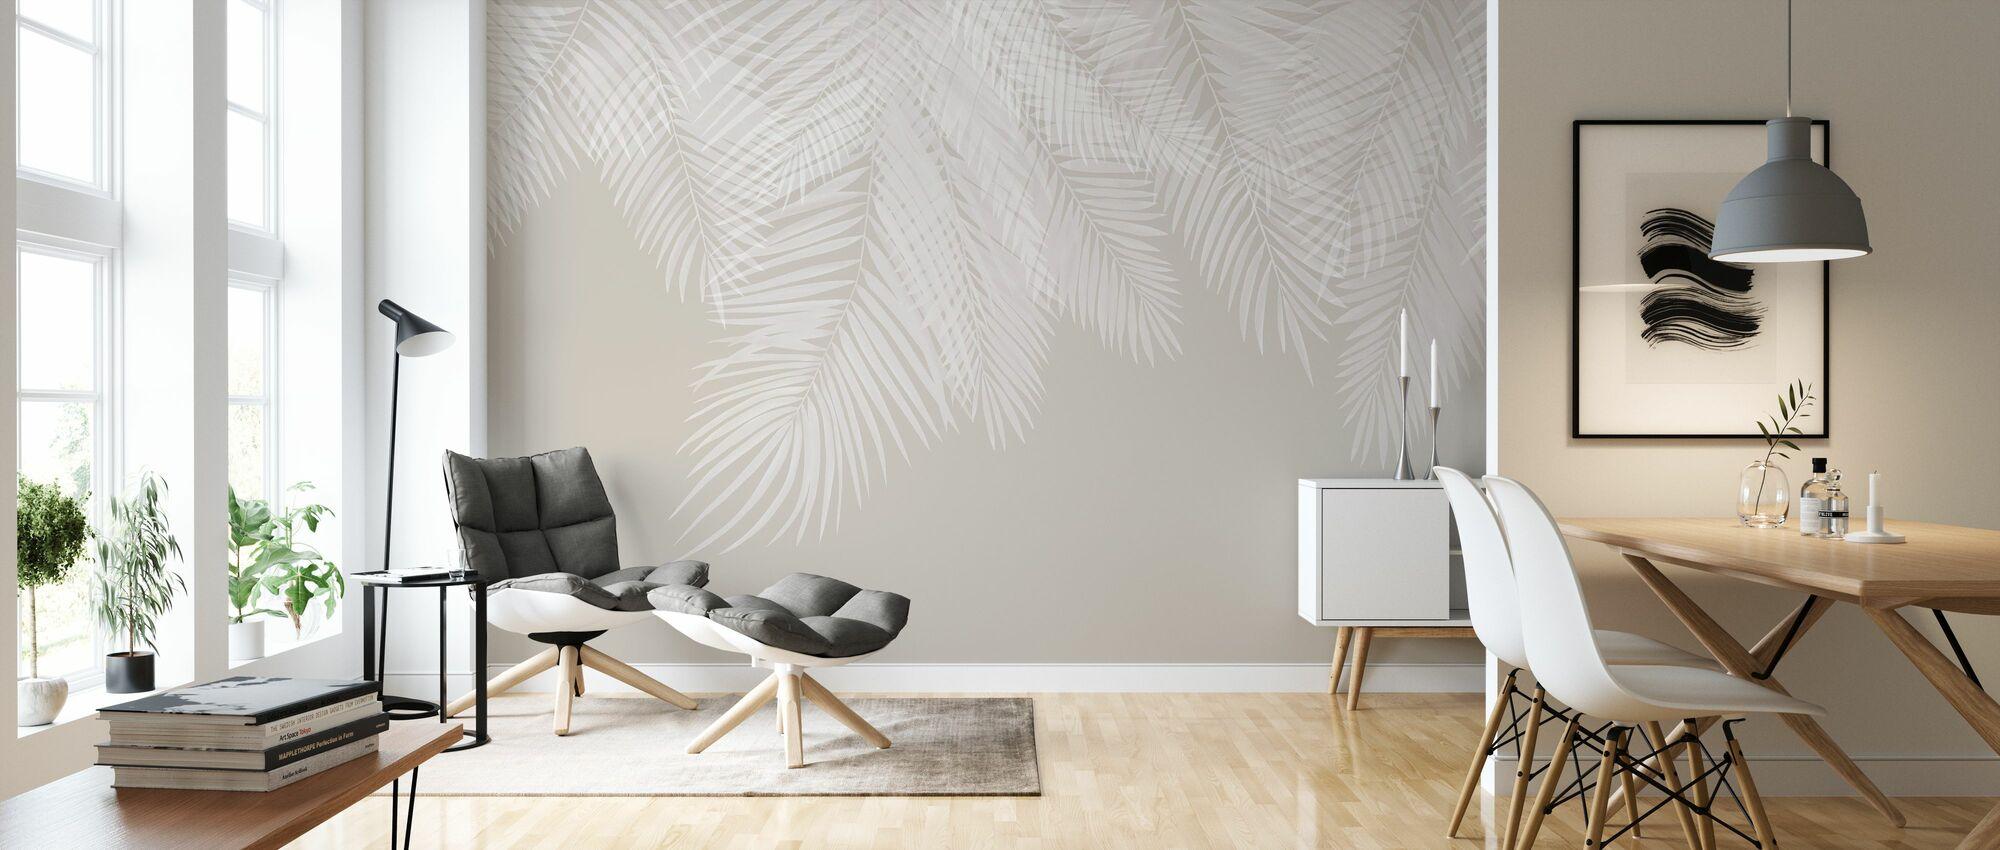 Hanging Palm Leaves - Beige-White - Wallpaper - Living Room